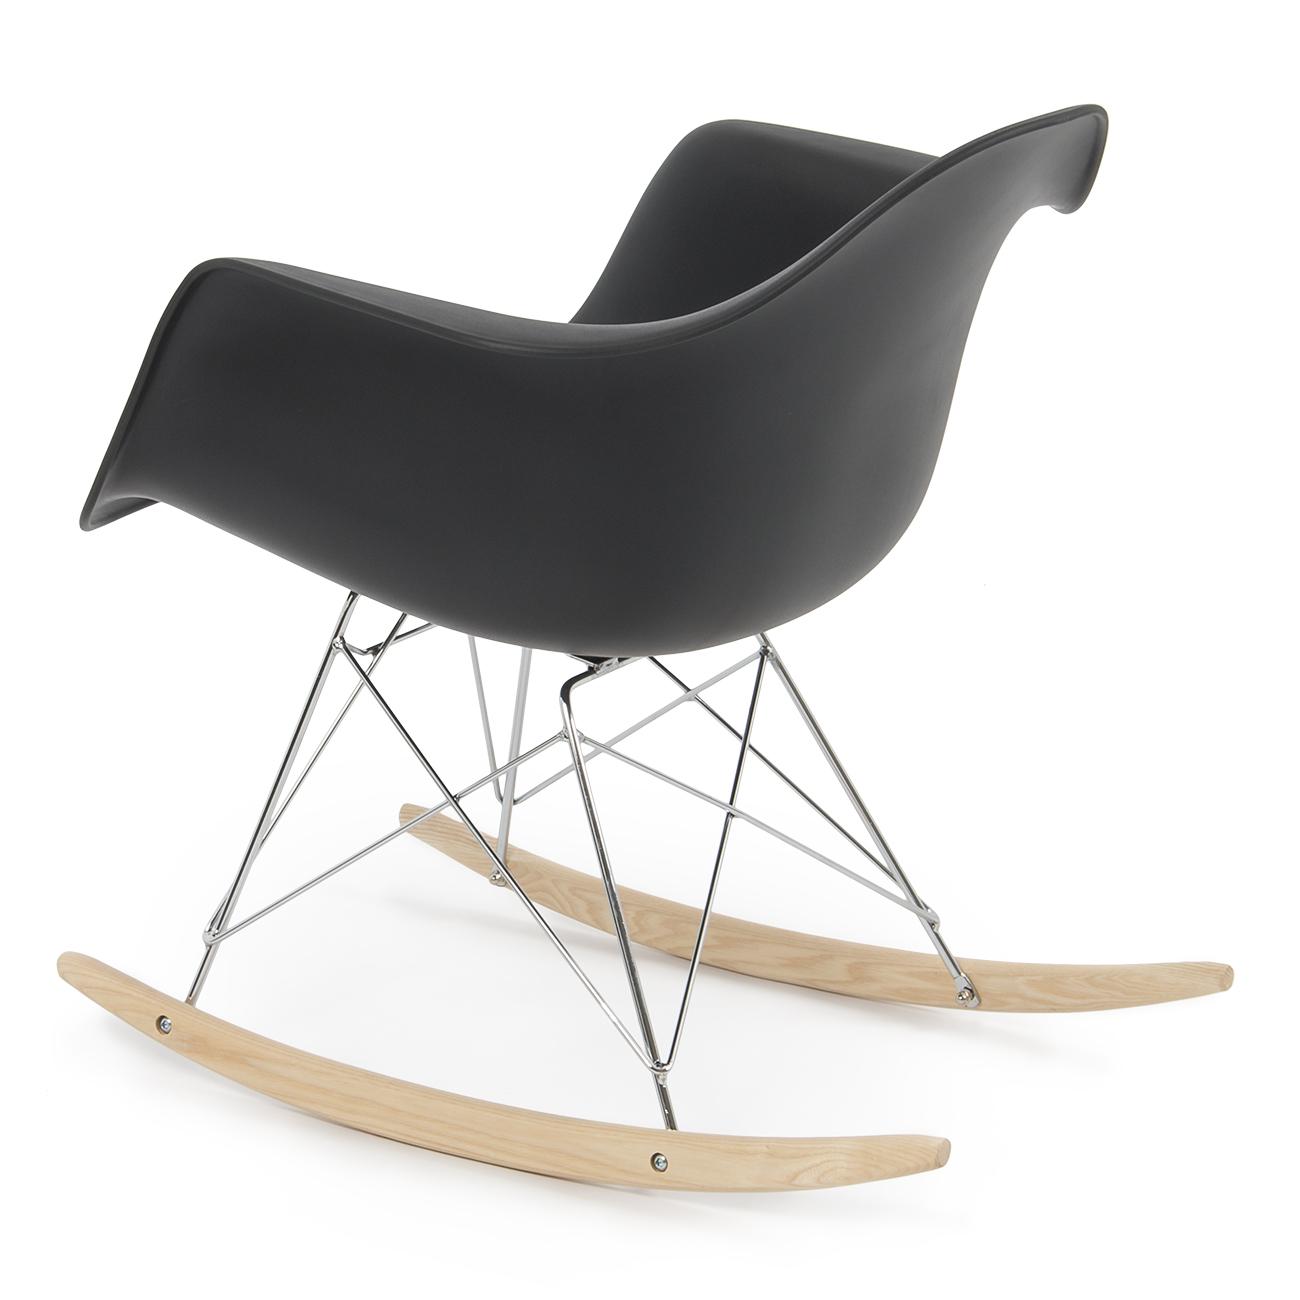 New eames rocker rocking indoor wood chair rar dsw style